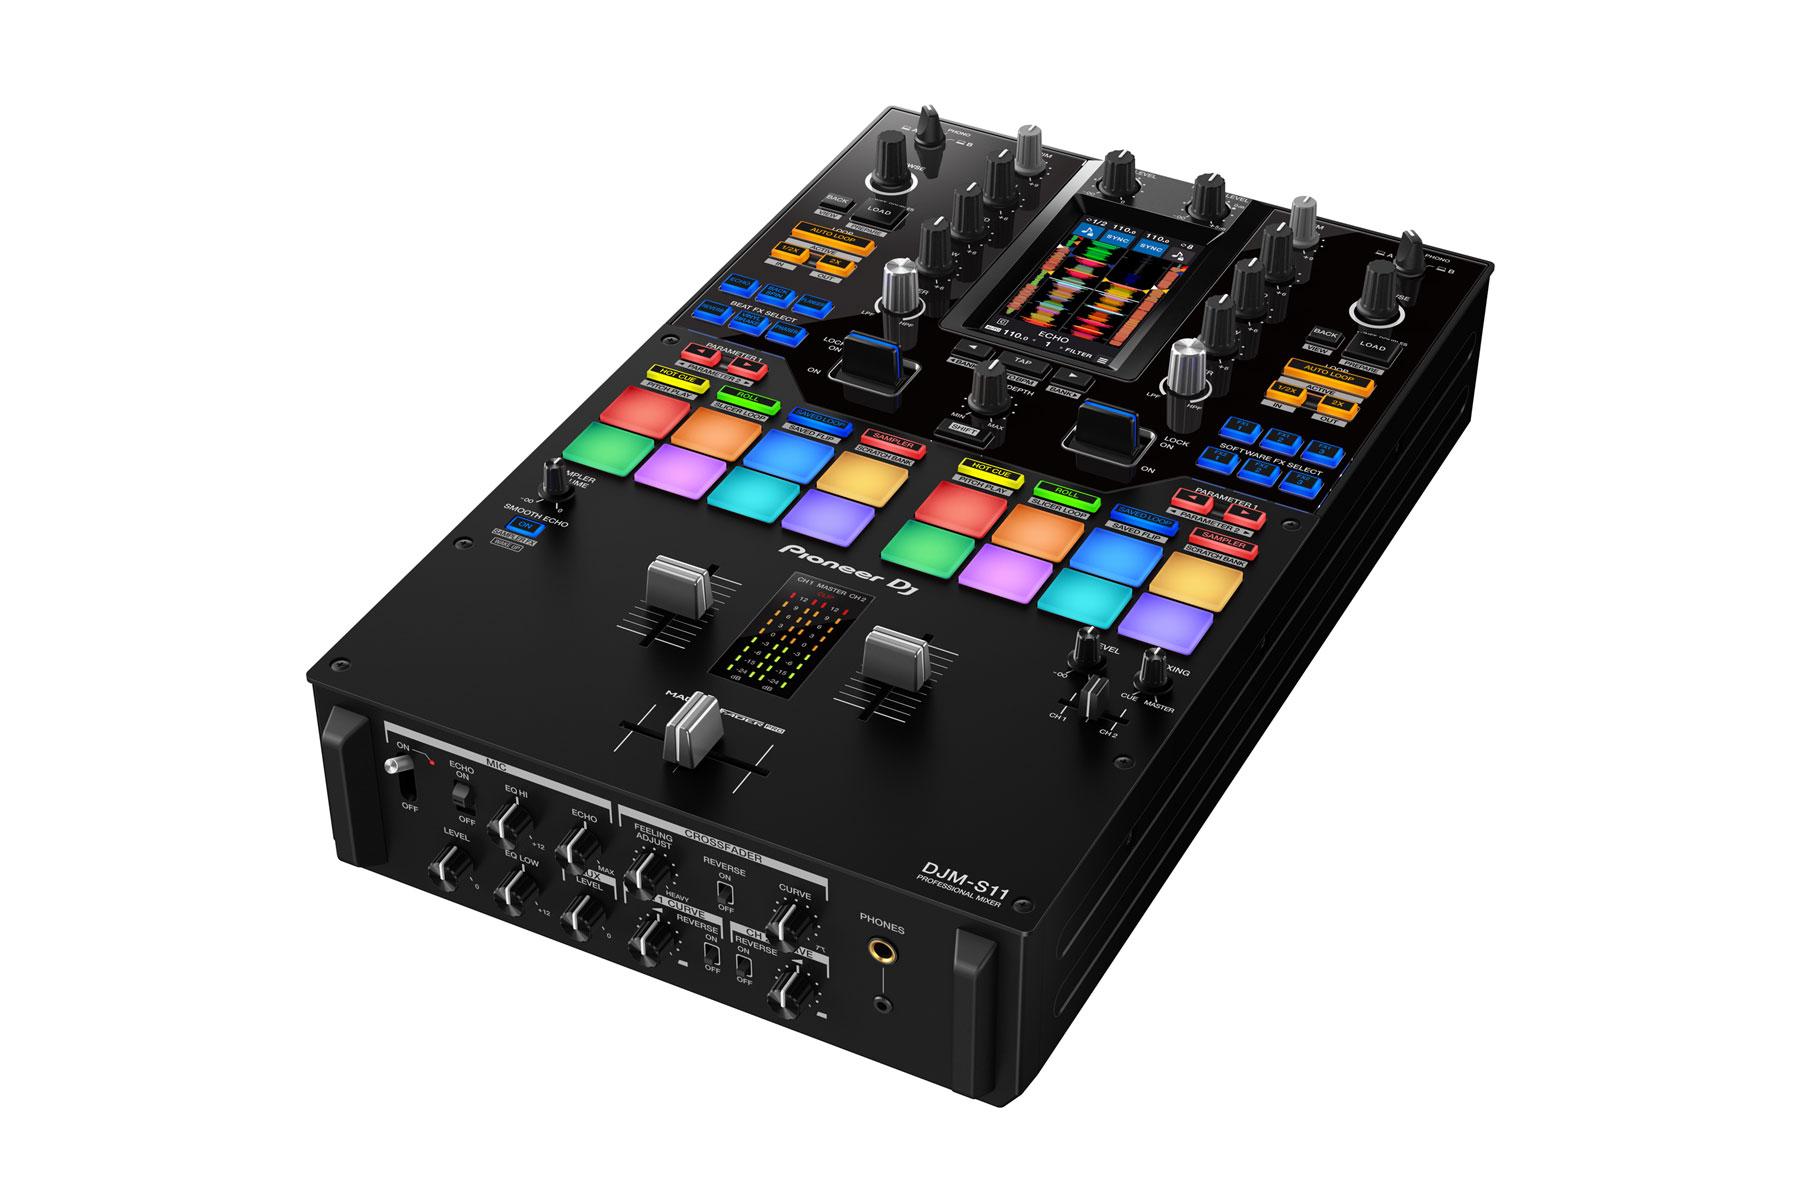 DJM-S11-top-down-xl1